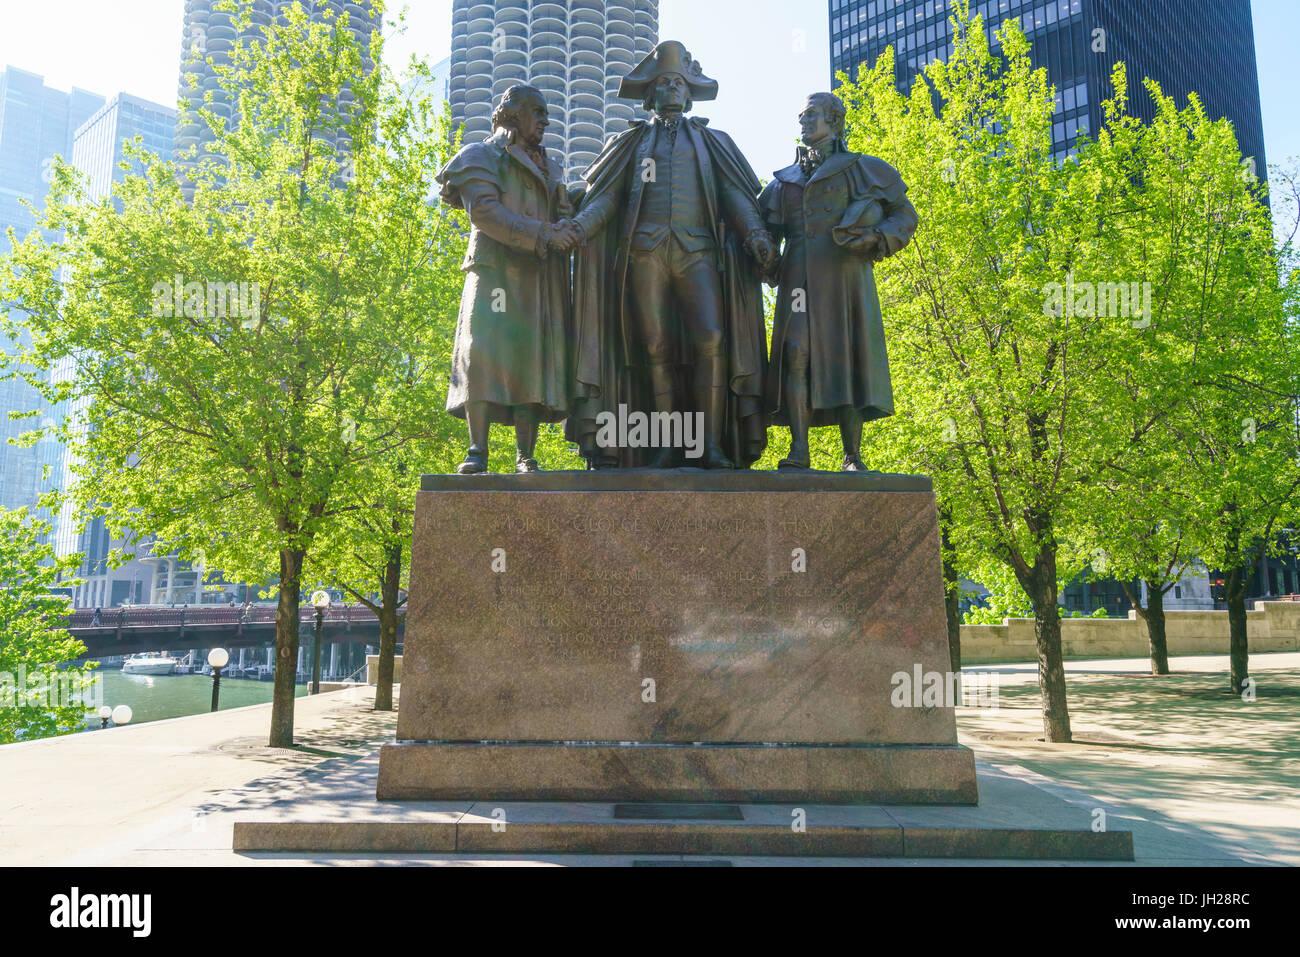 Robert Morris, George Washington, Haym Salomon Memorial statue stands by the Chicago River, Chicago, Illinois, USA Stock Photo